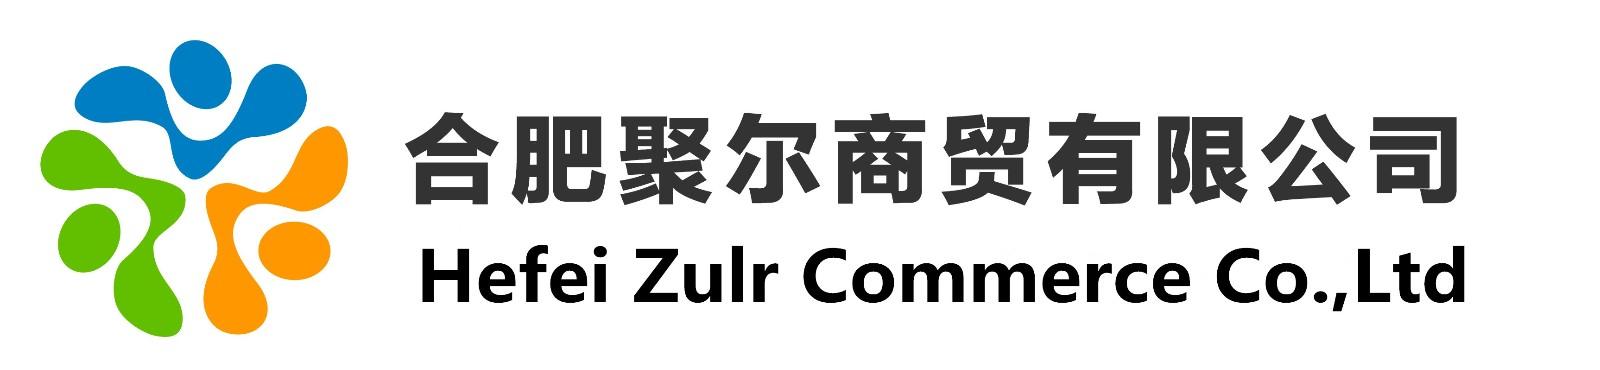 HeFei Zulr Commerce Co., Ltd